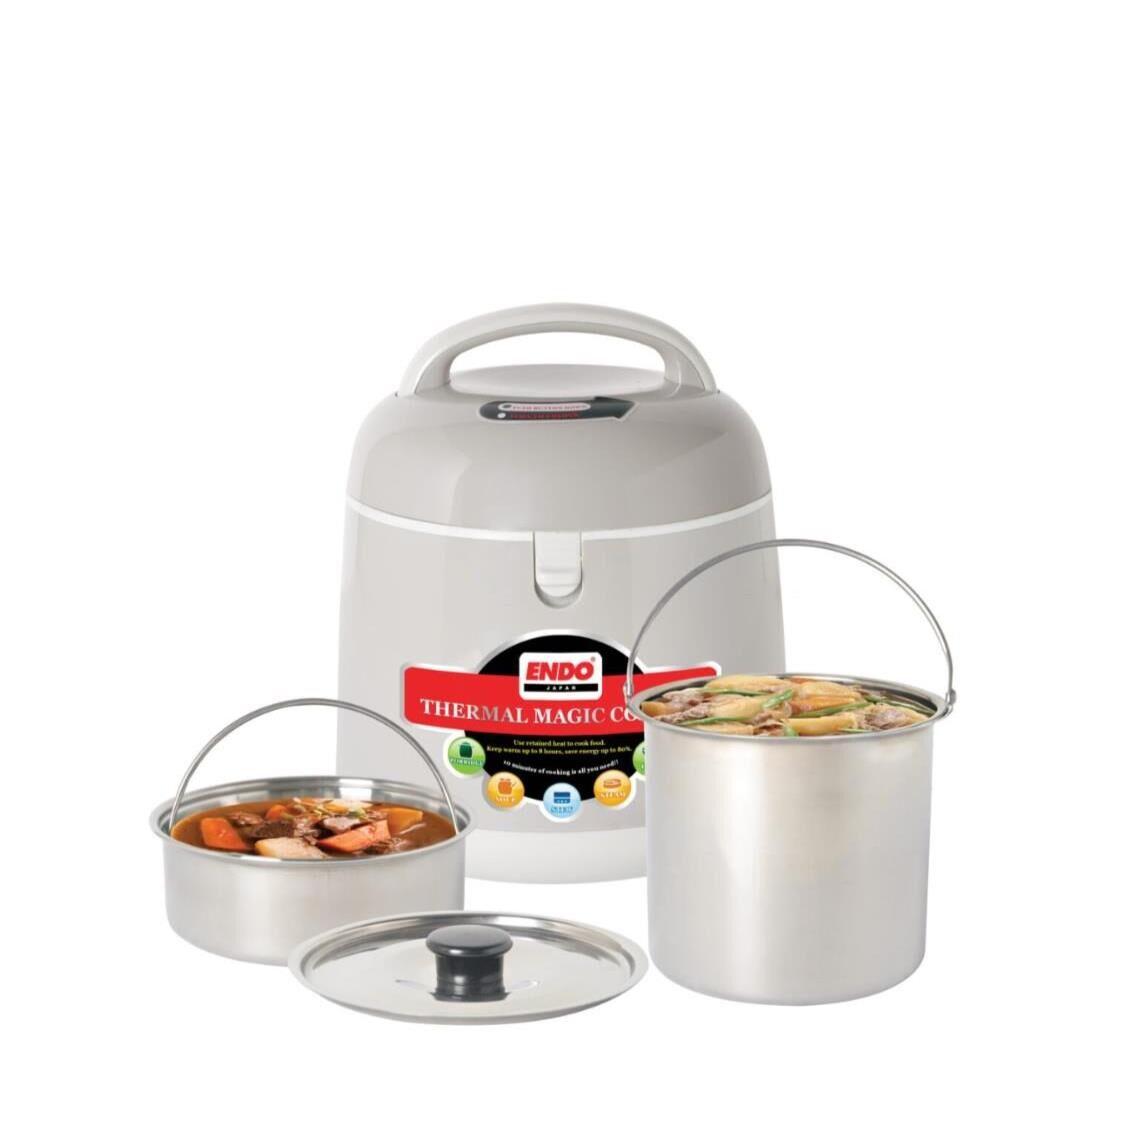 Endo 25L Thermal Magic Cooker